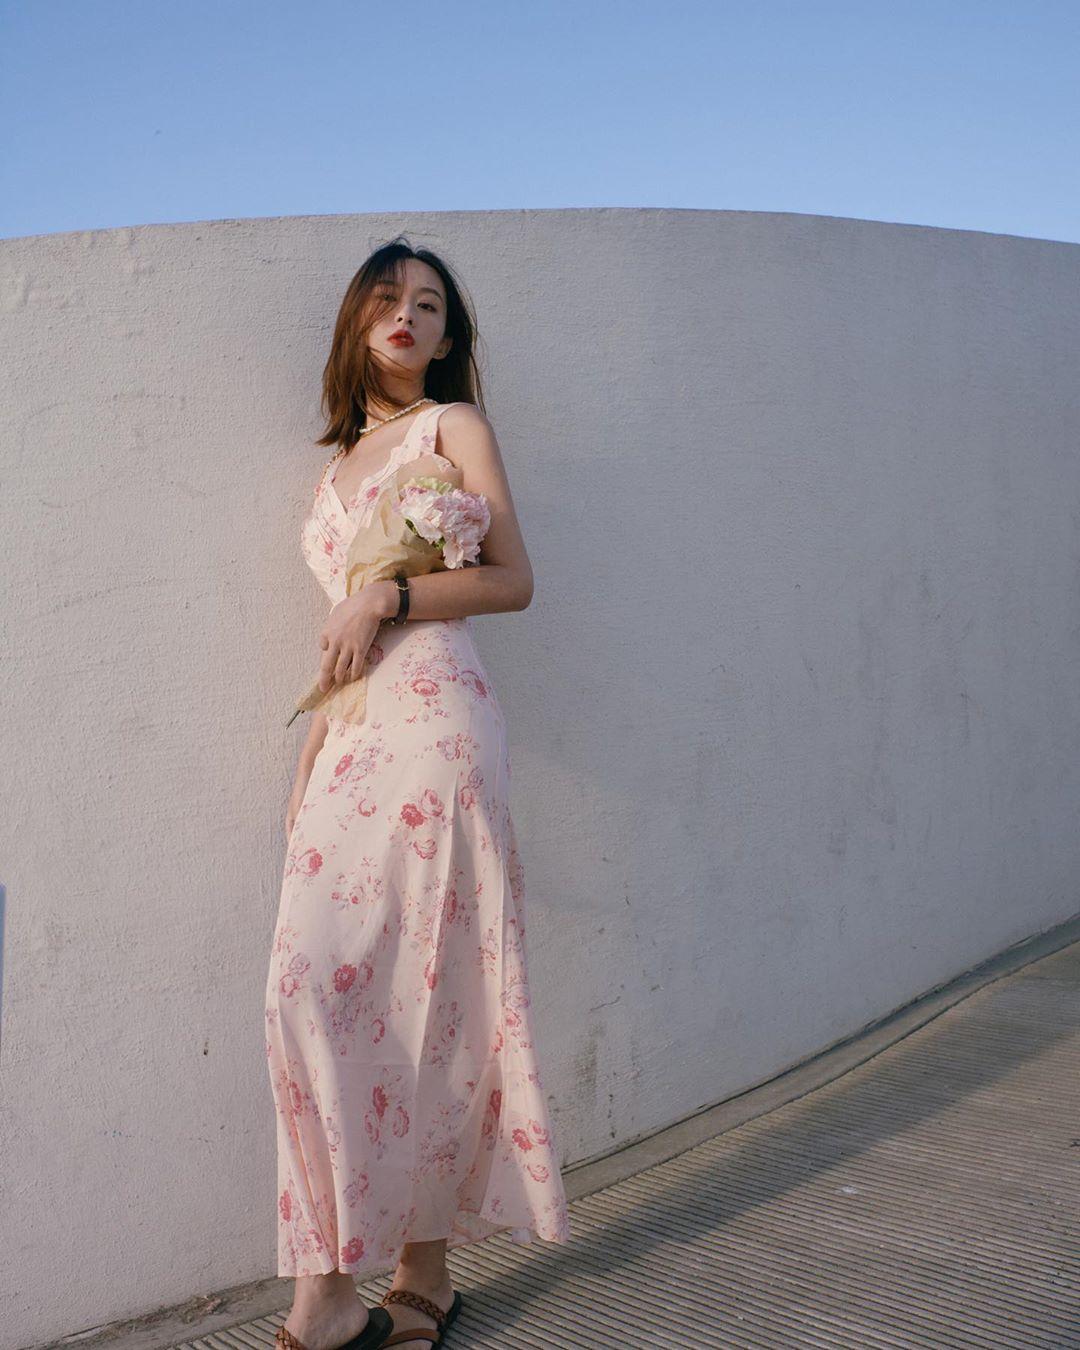 đầm hoa hai dây hồng phong cách soft aesthetic